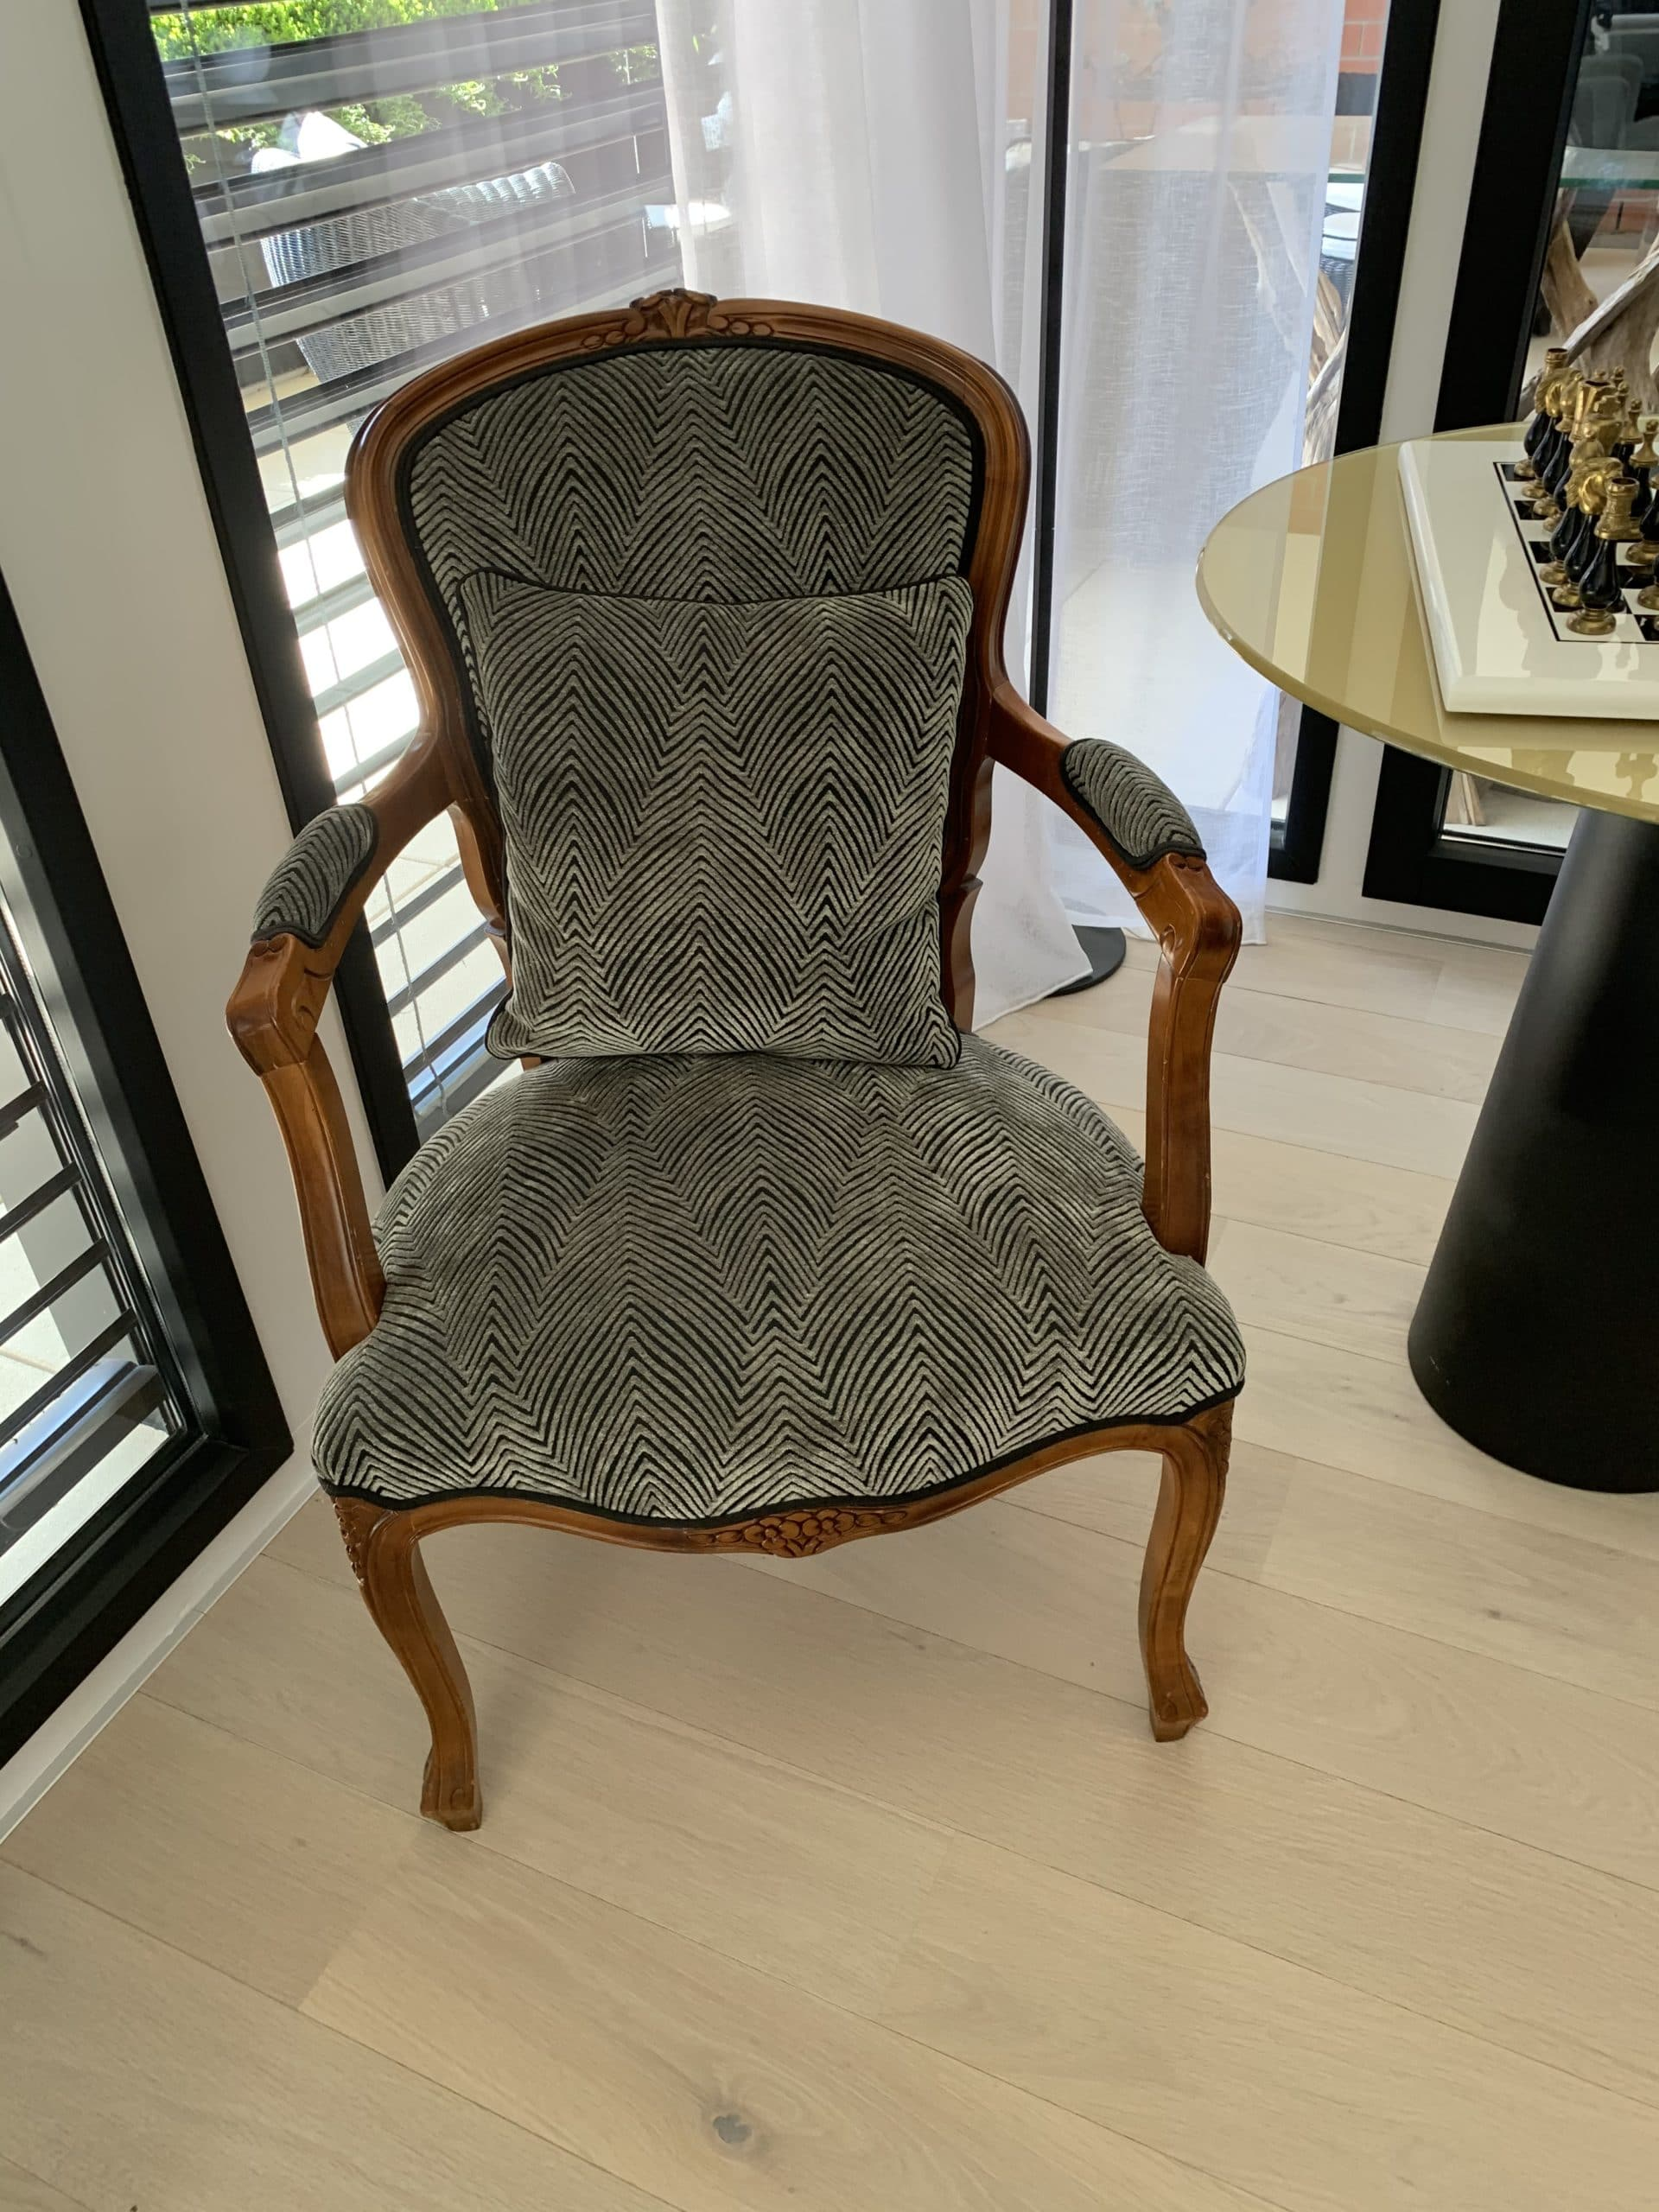 Chaise d'origine